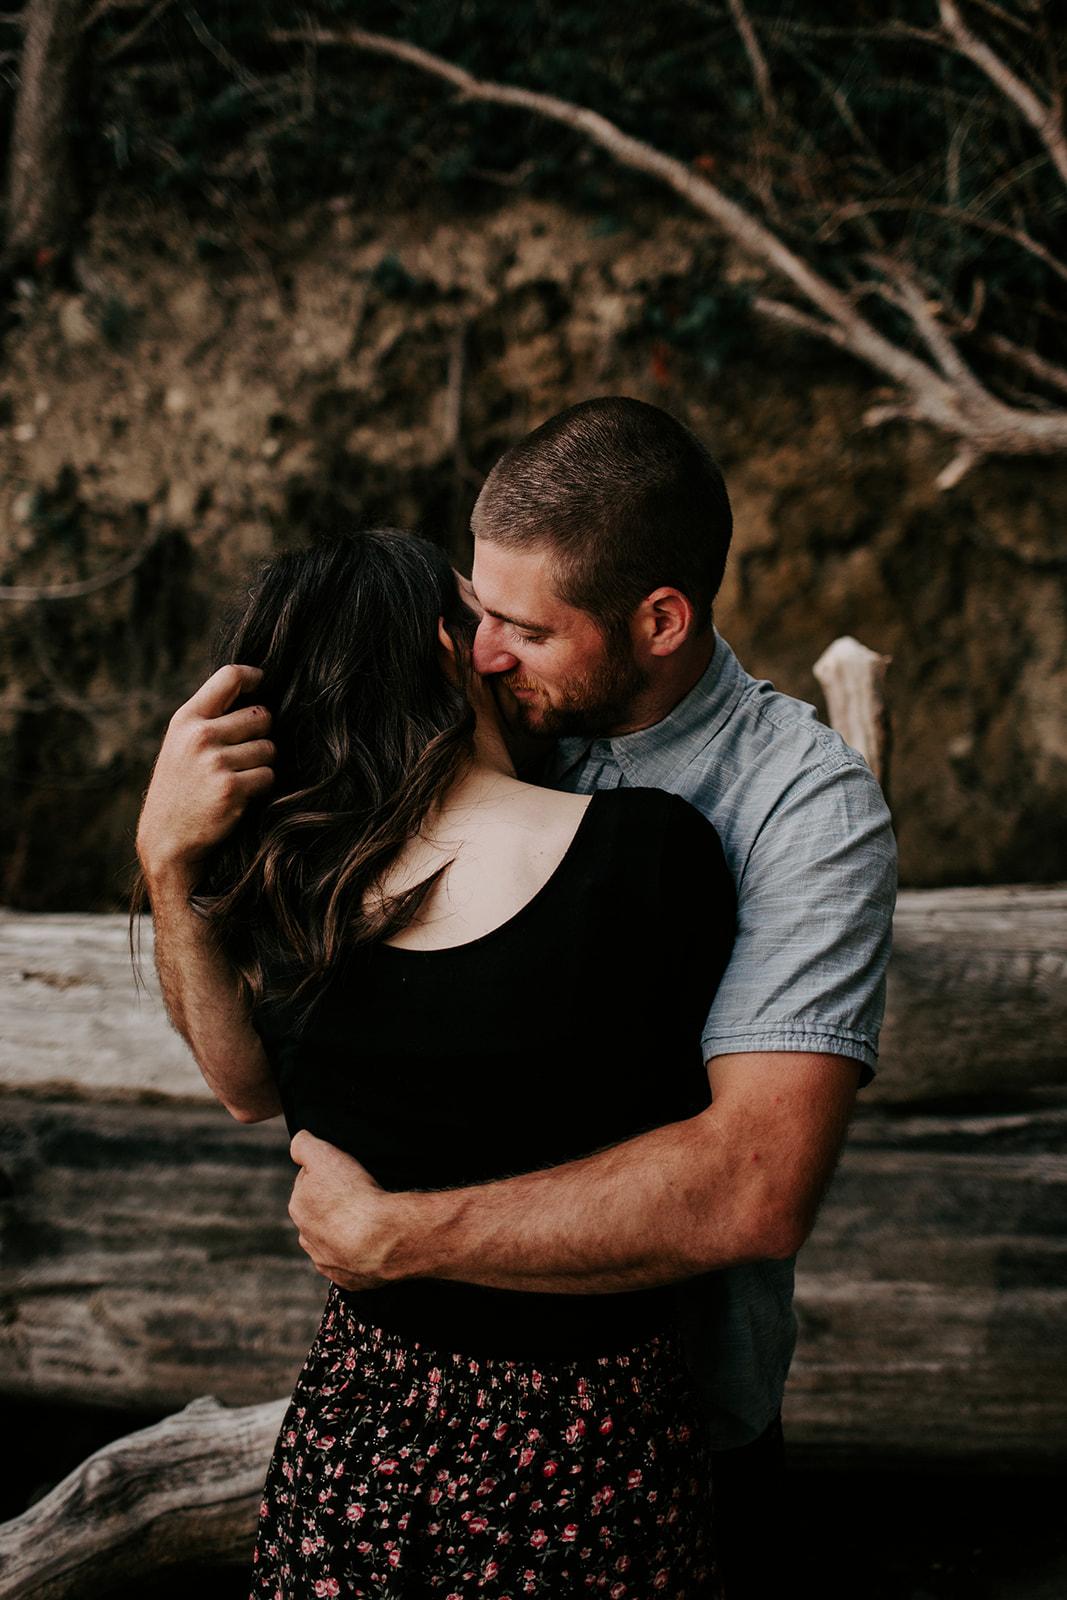 Chuckanut-Clayton-Beach-Bellingham-WA-Engagement-Megan-Gallagher-Photography